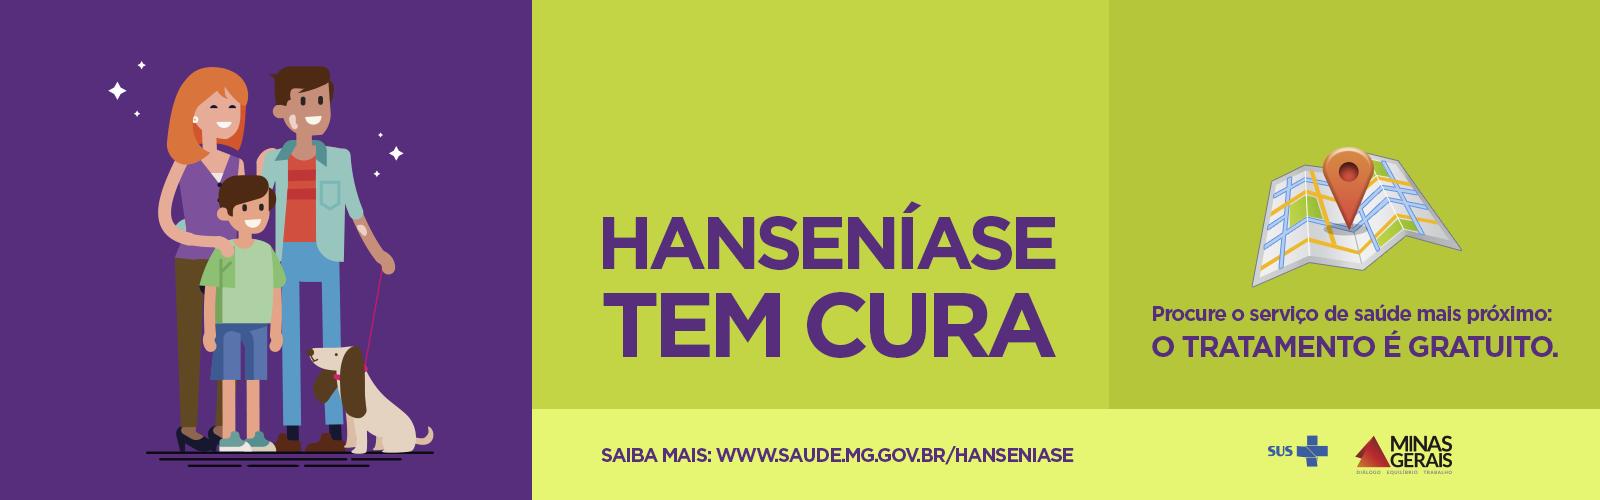 Hanseníase 2018